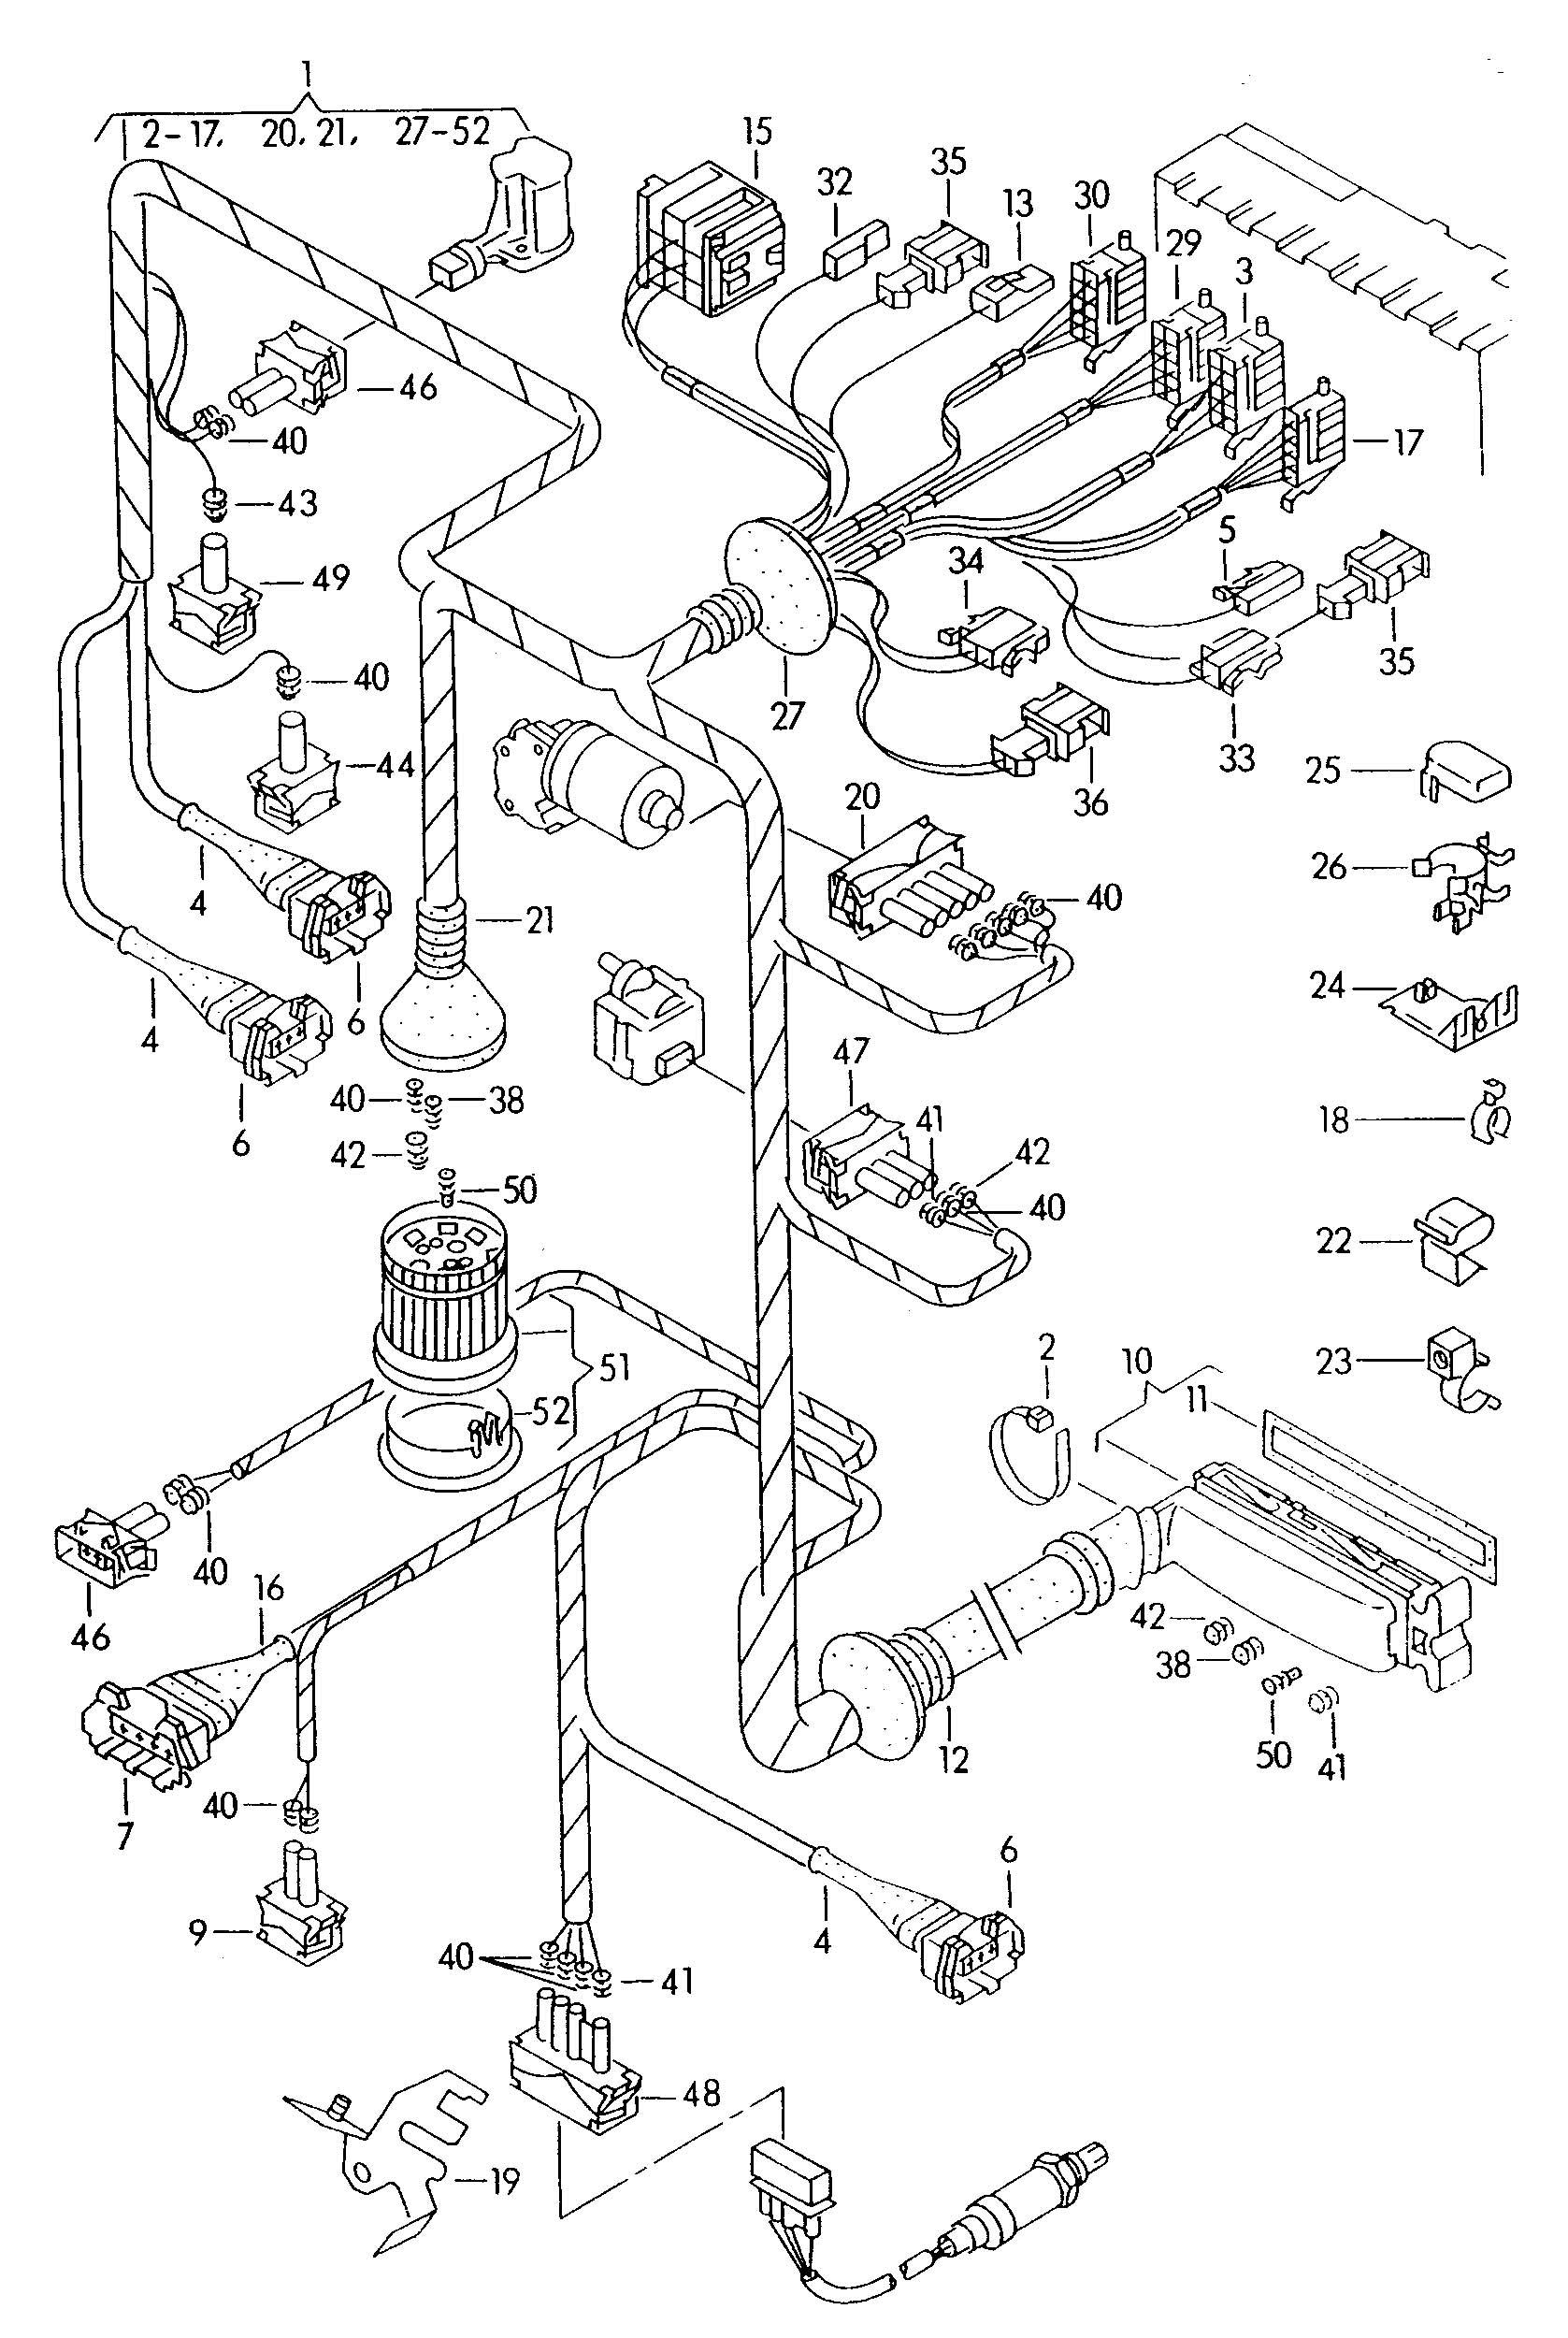 2000 vw jetta aftermarket parts